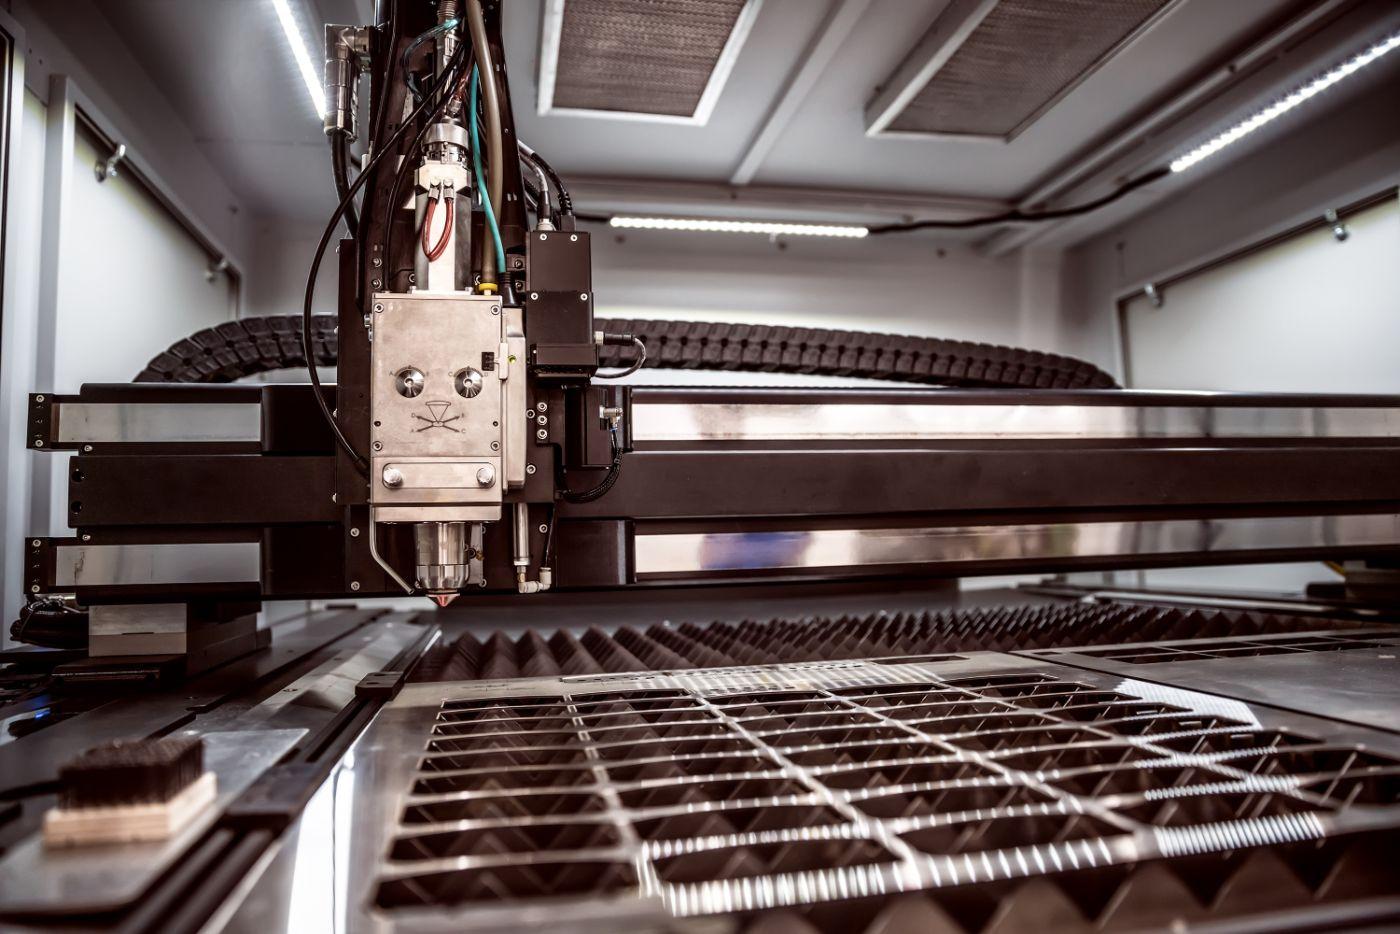 cnc-laser-cutting-of-metal-modern-industrial-PYQPRRC